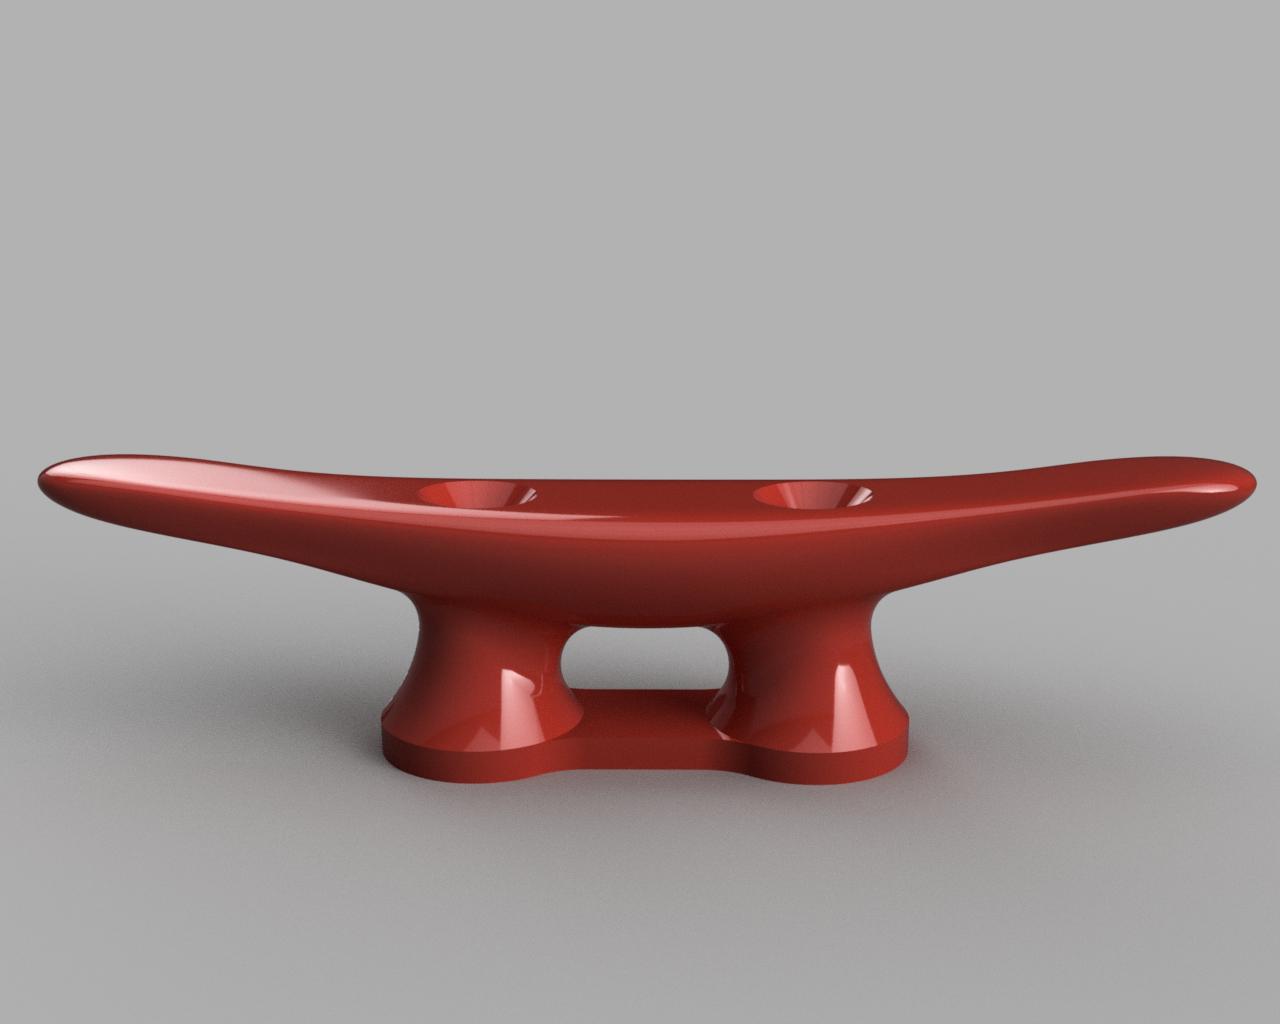 taquet2.png Download STL file Cleat • Design to 3D print, francknos